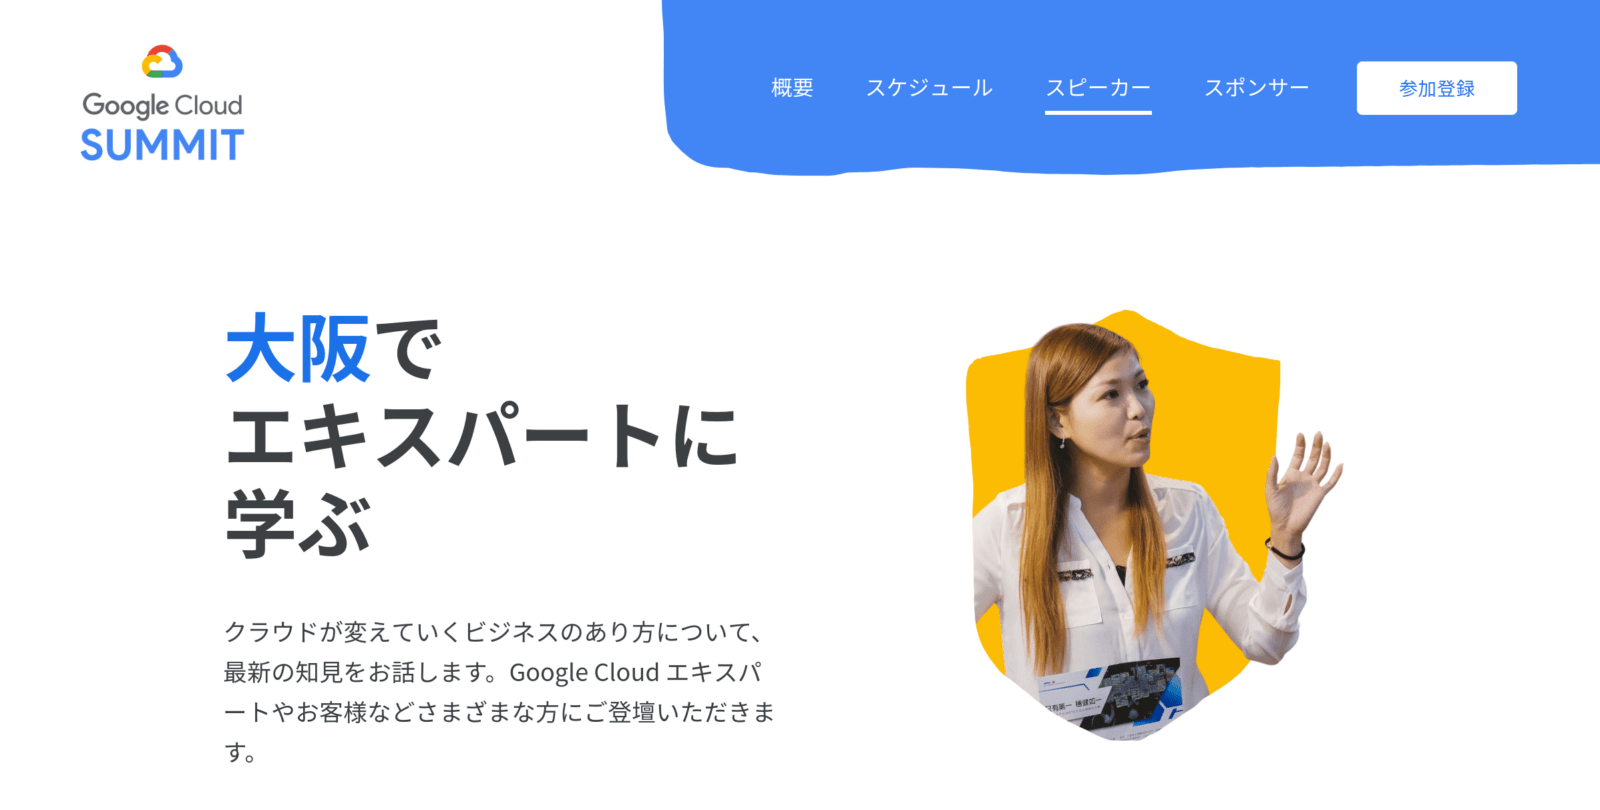 Google Cloud Summit '19 in 大阪:大阪でエキスパートに学ぶ